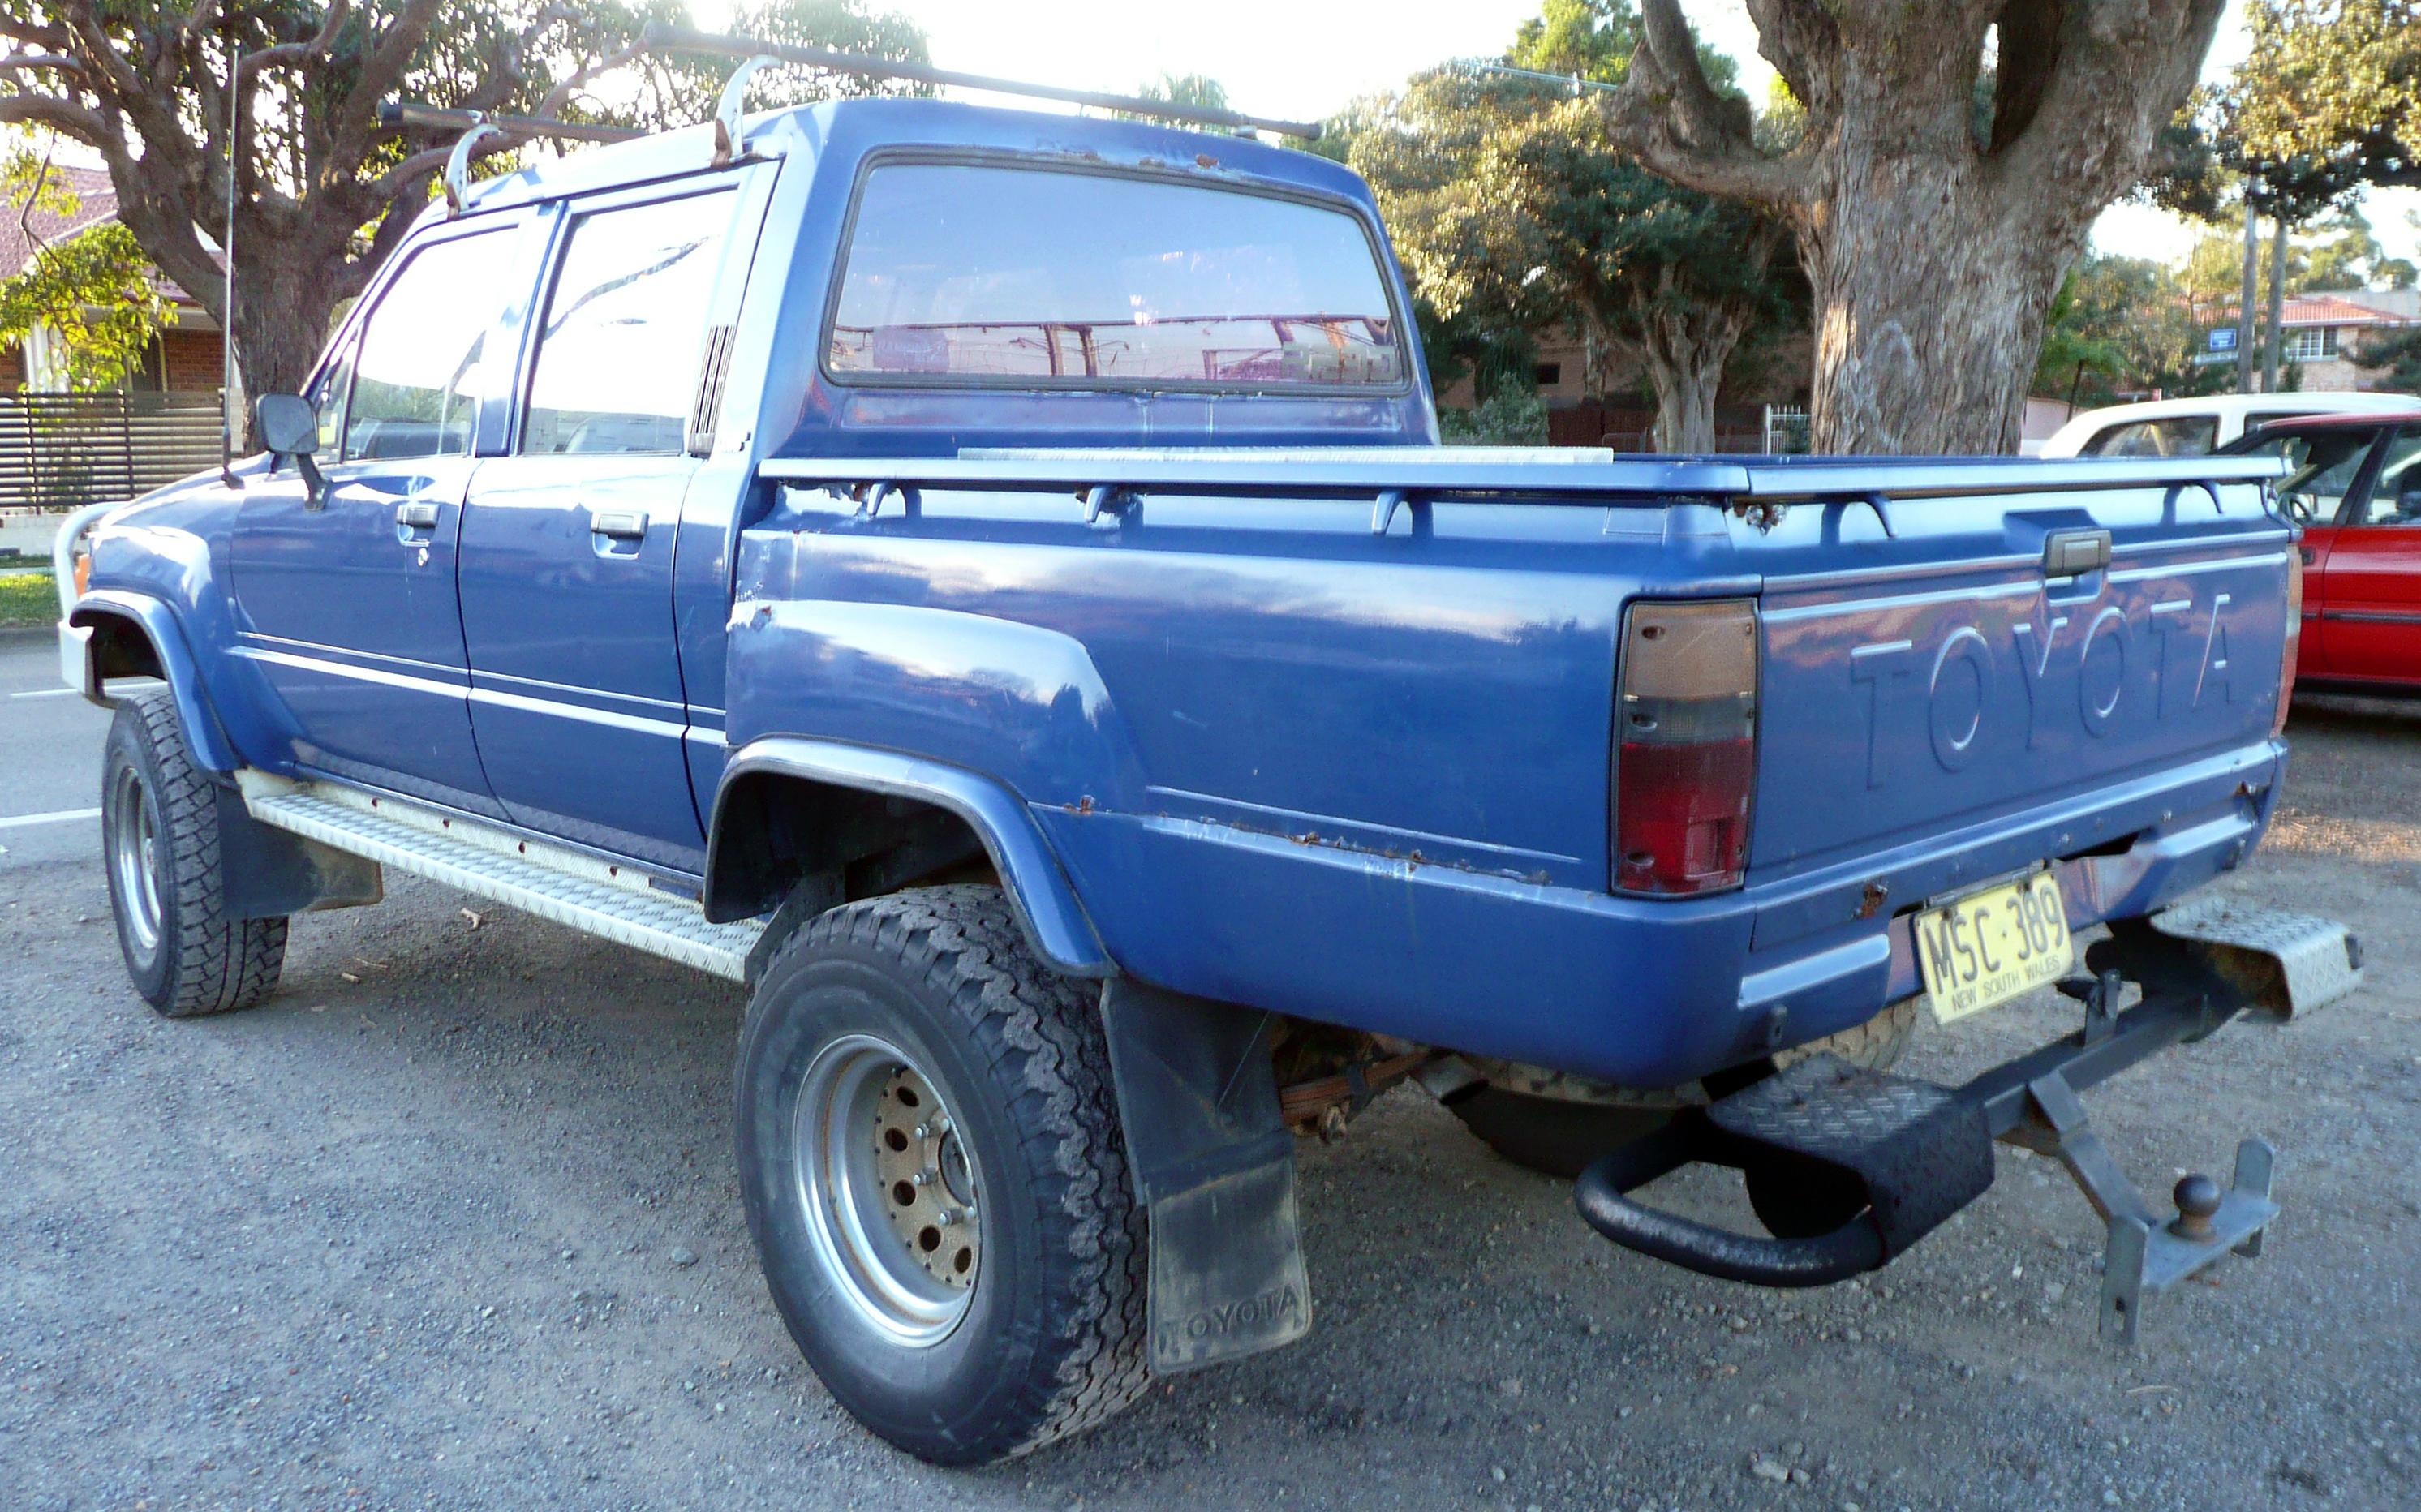 File:1983-1988 Toyota Hilux 4-door utility 01.jpg - Wikimedia Commons